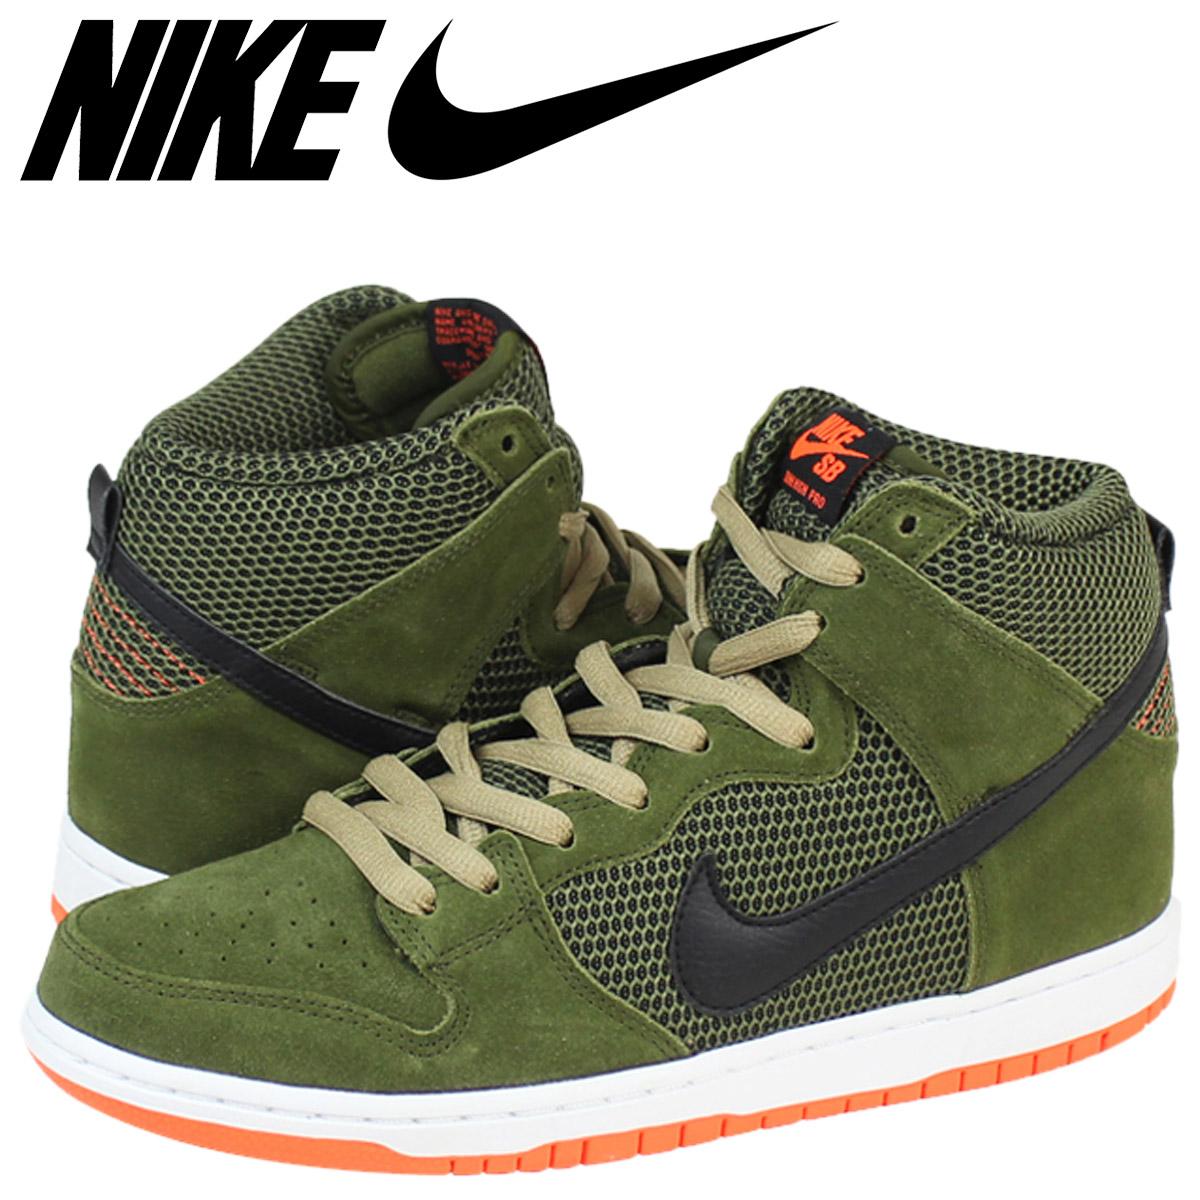 the best attitude 5e699 54bd0 Nike NIKE dunk sneakers DUNK HI PRO SB Dunk high Pro SB limited 305050-308  suede men's